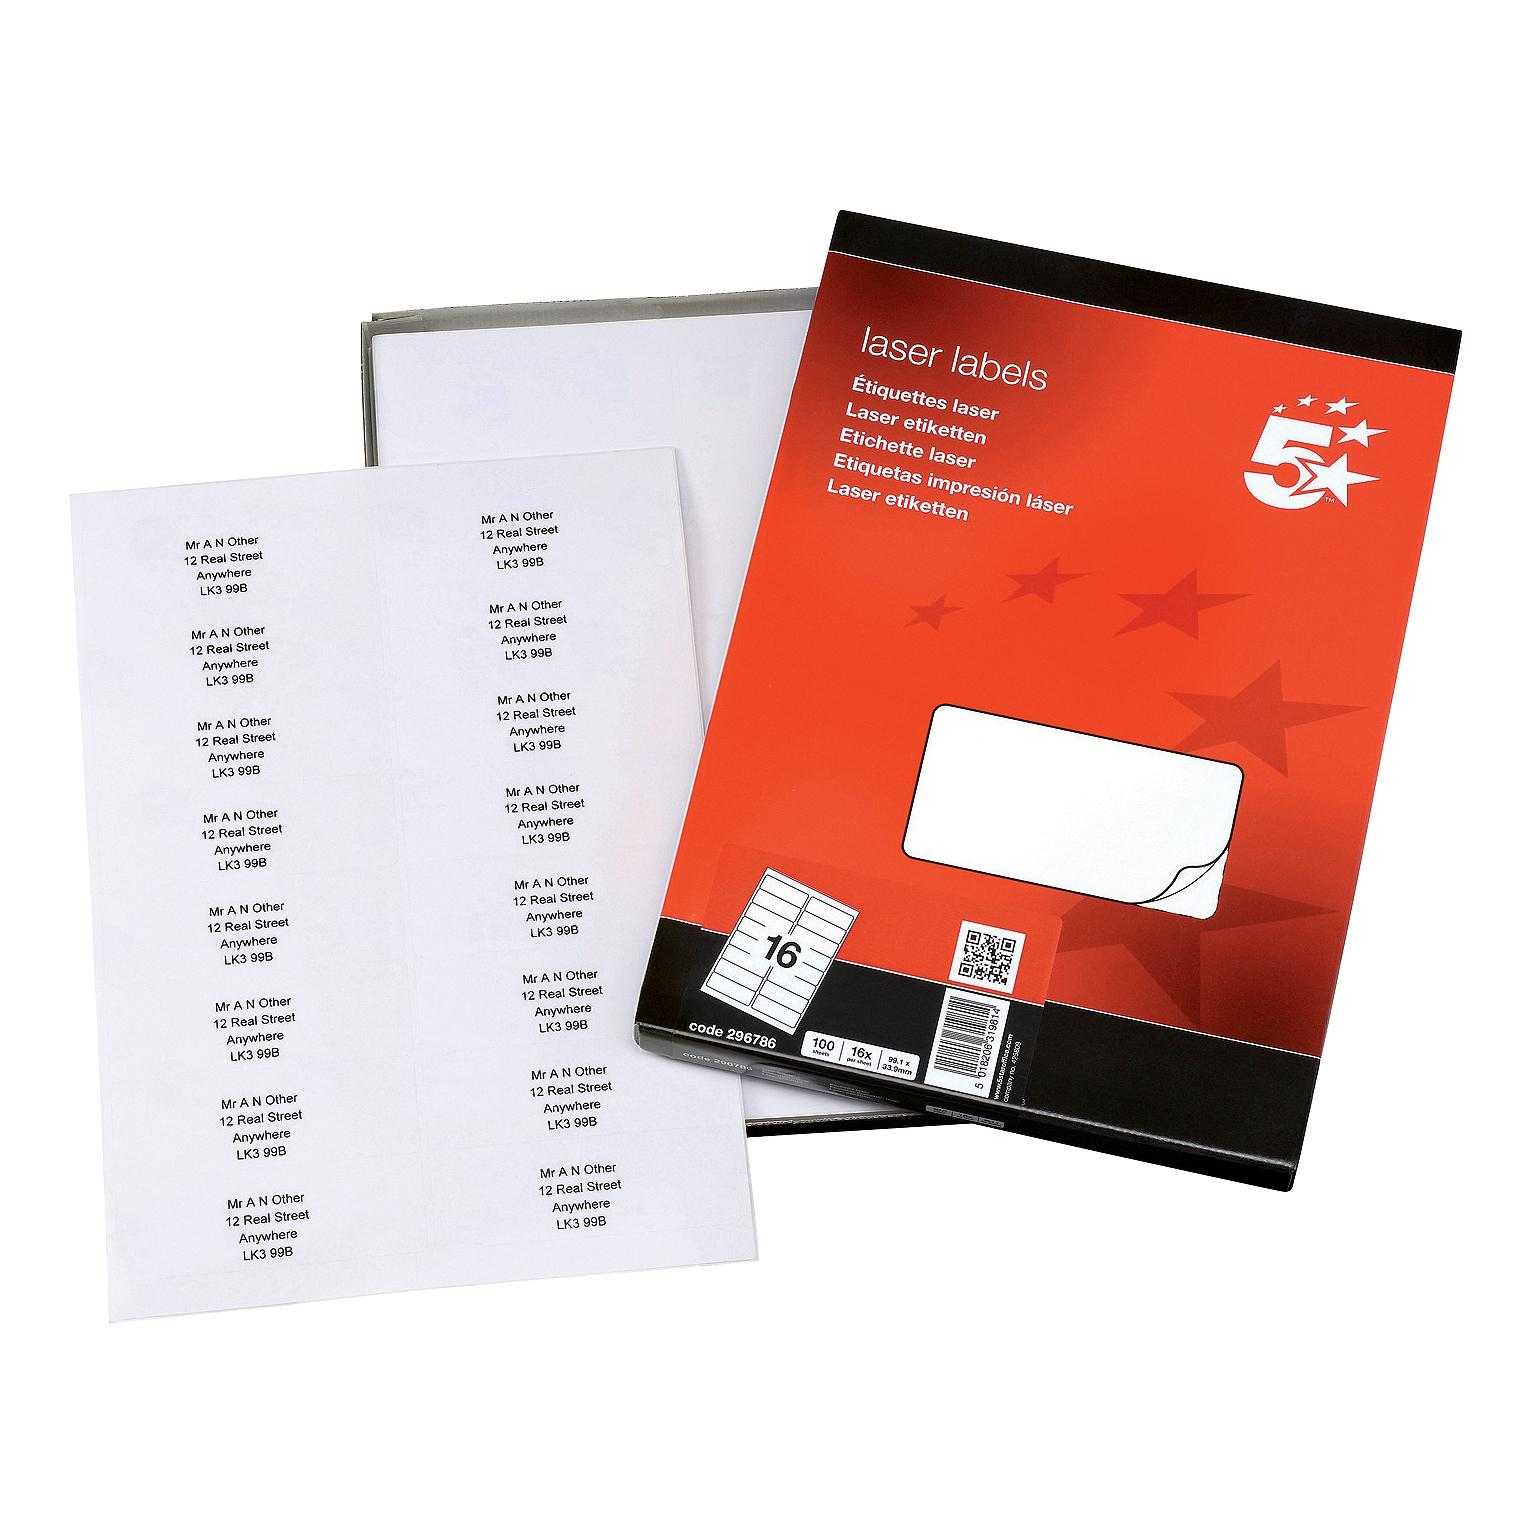 5 Star Office Multipurpose Labels Laser Copier Inkjet 16 per Sheet 99.1x34mm White [1600 Labels]